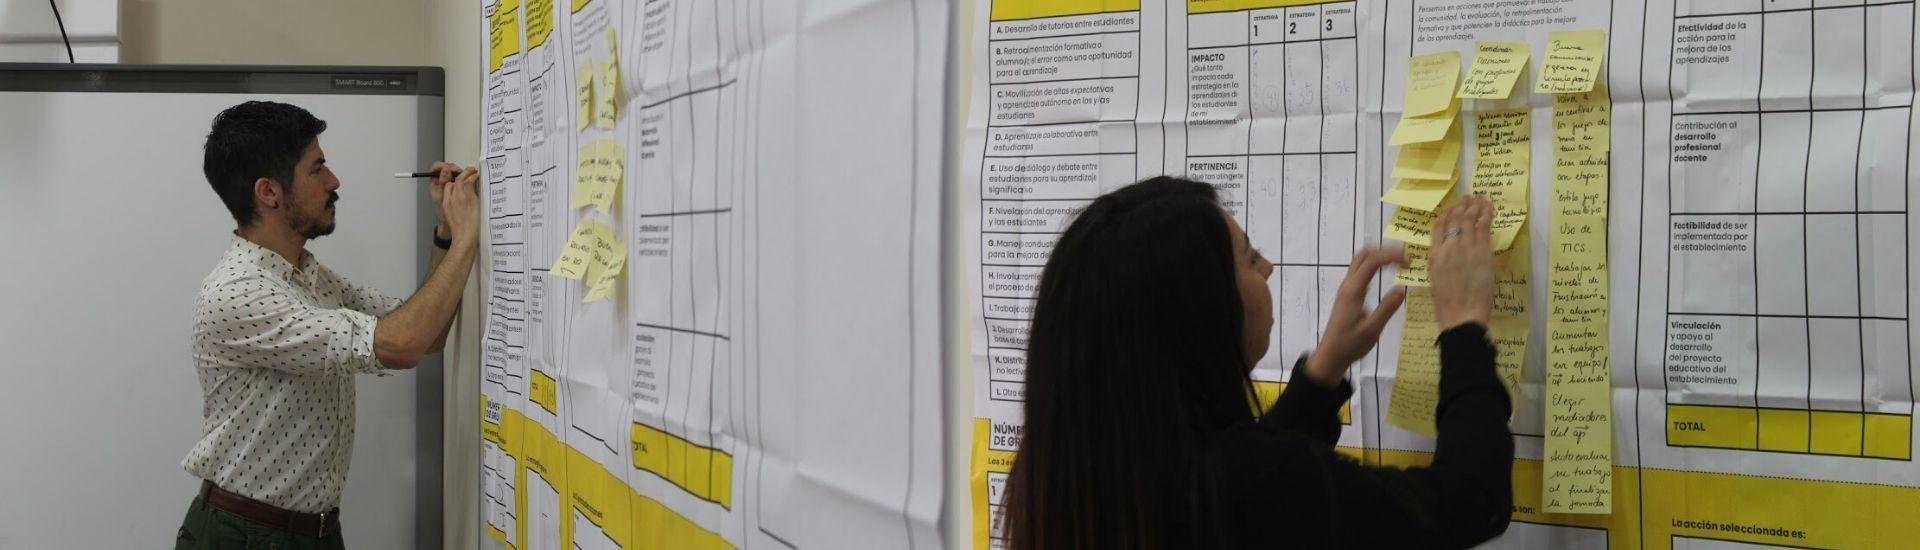 Dos fotos de personas participando de Ideas docentes